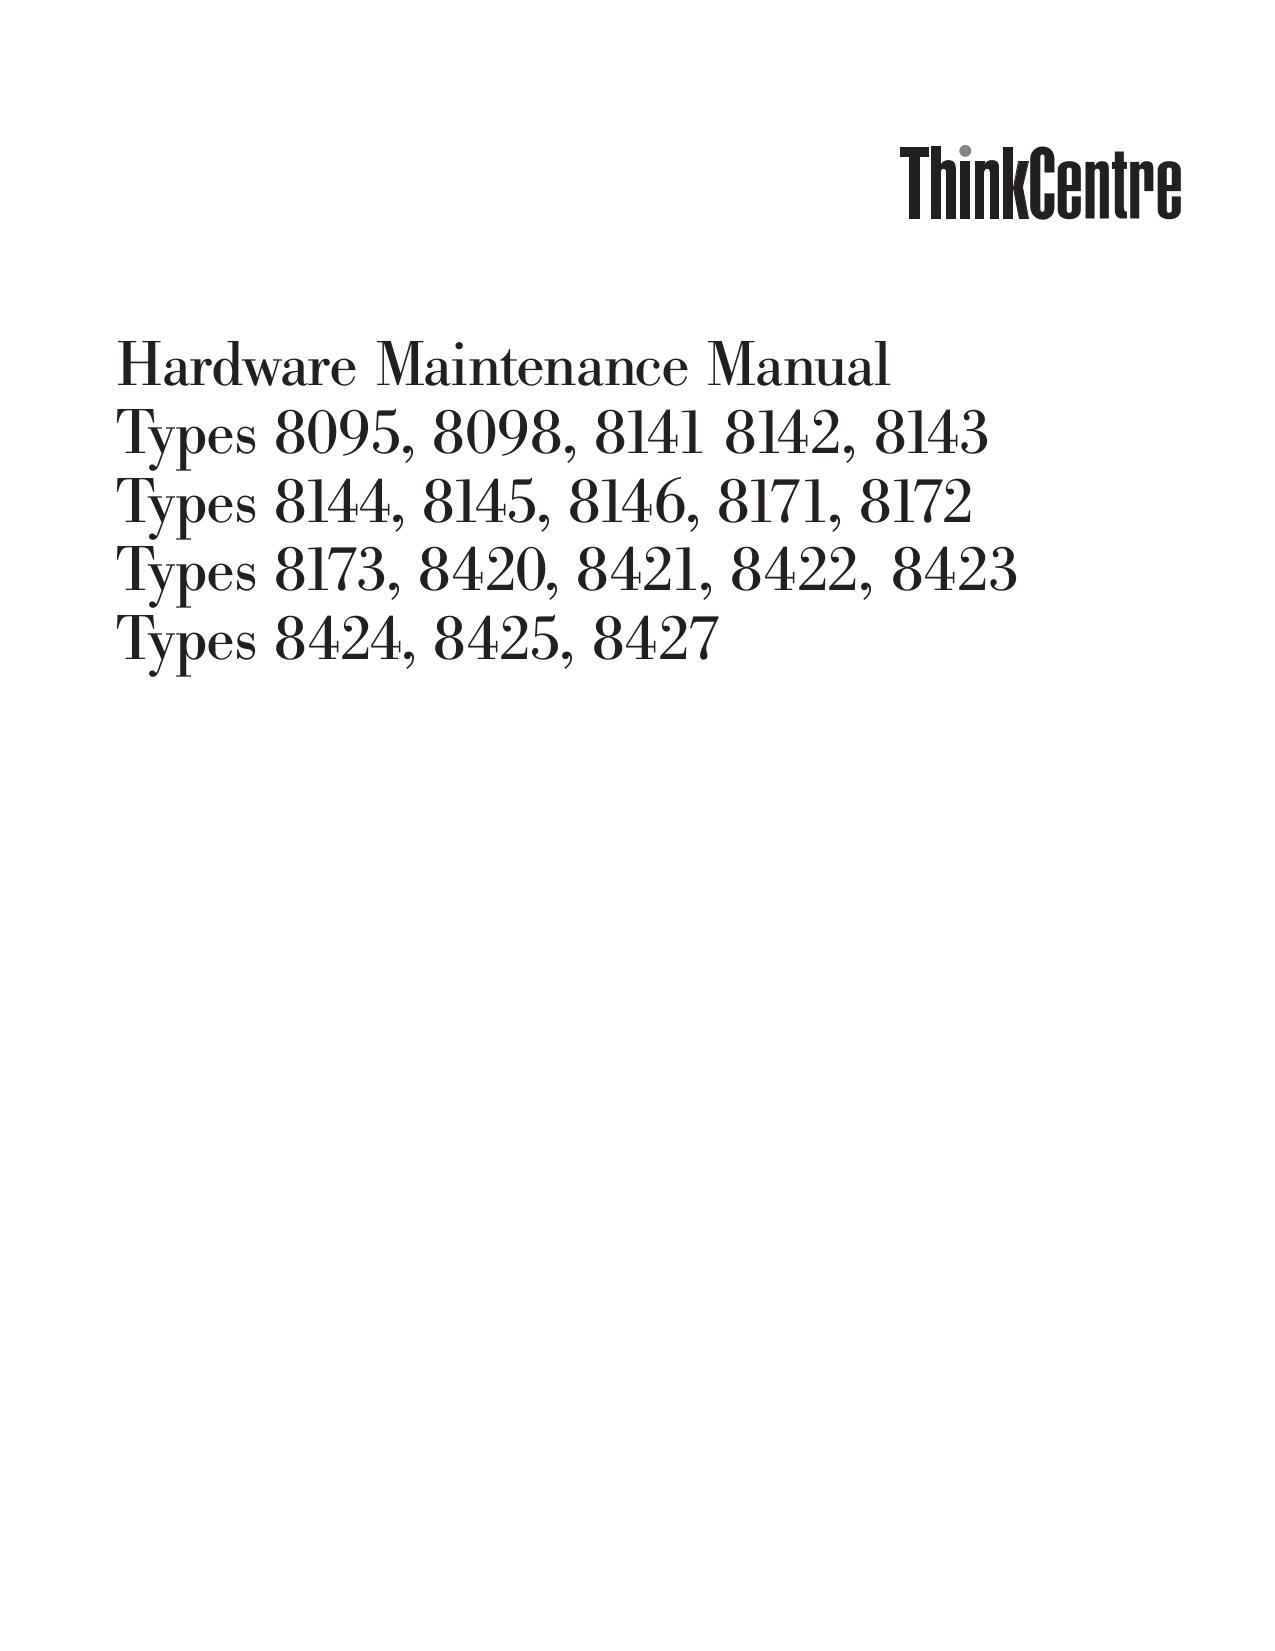 pdf for Lenovo Desktop ThinkCentre A51p 8422 manual